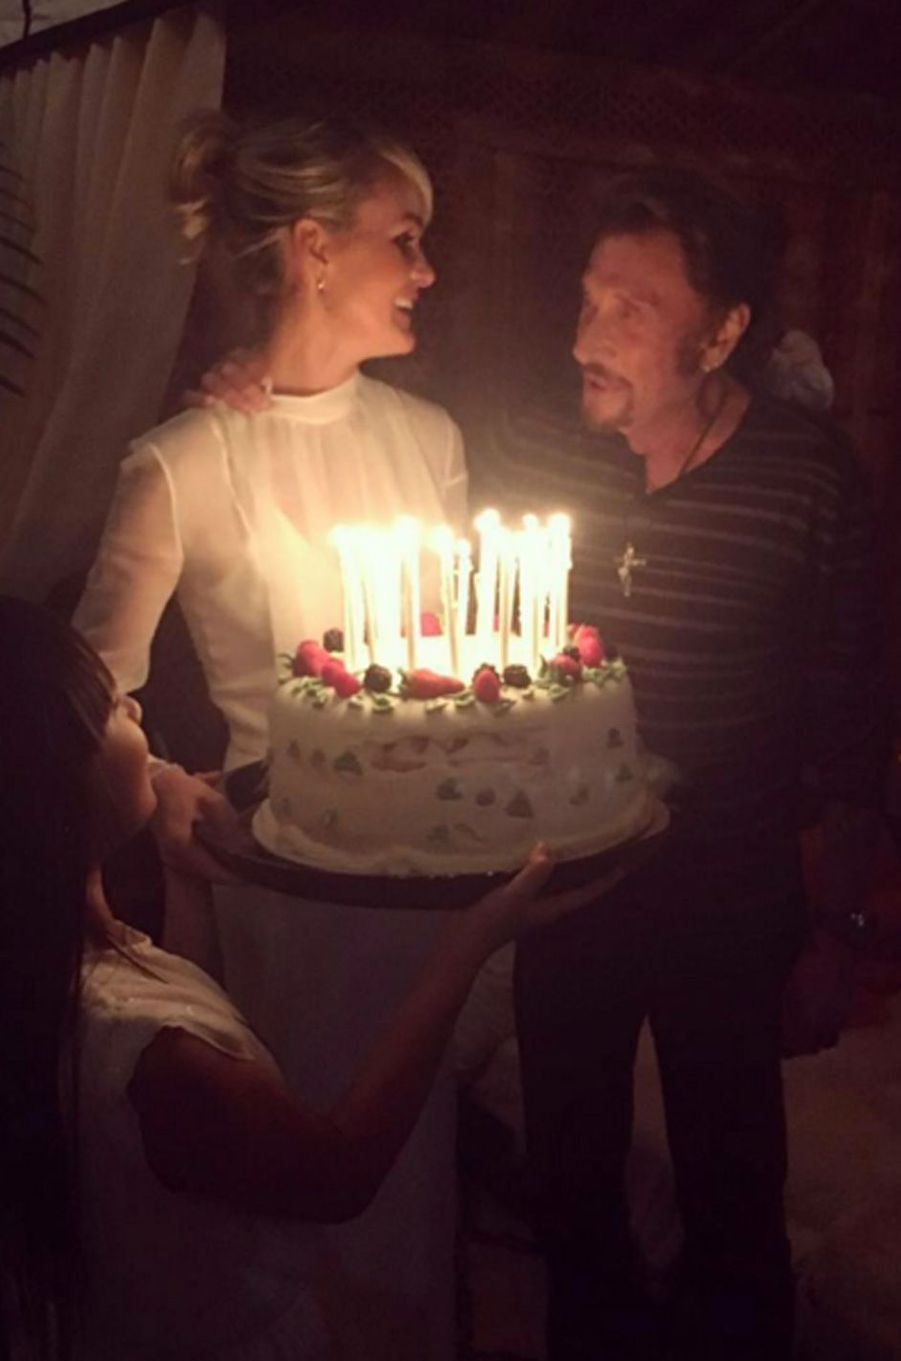 Laeticia Hallyday souhaite un joyeux anniversaire à son mari Johnny Hallyday